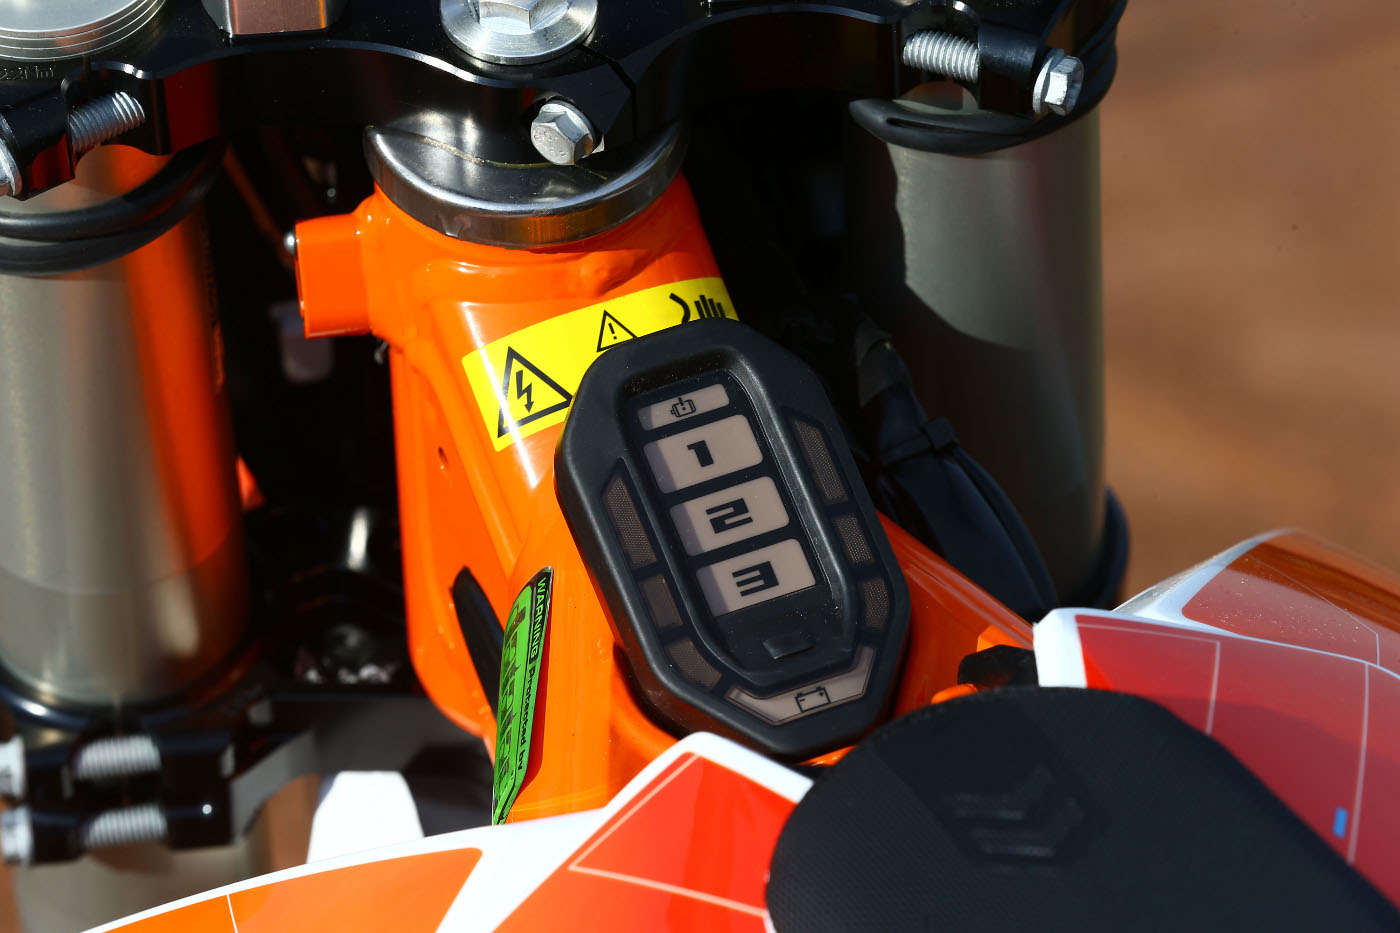 Used Ktm Motorcycle Parts